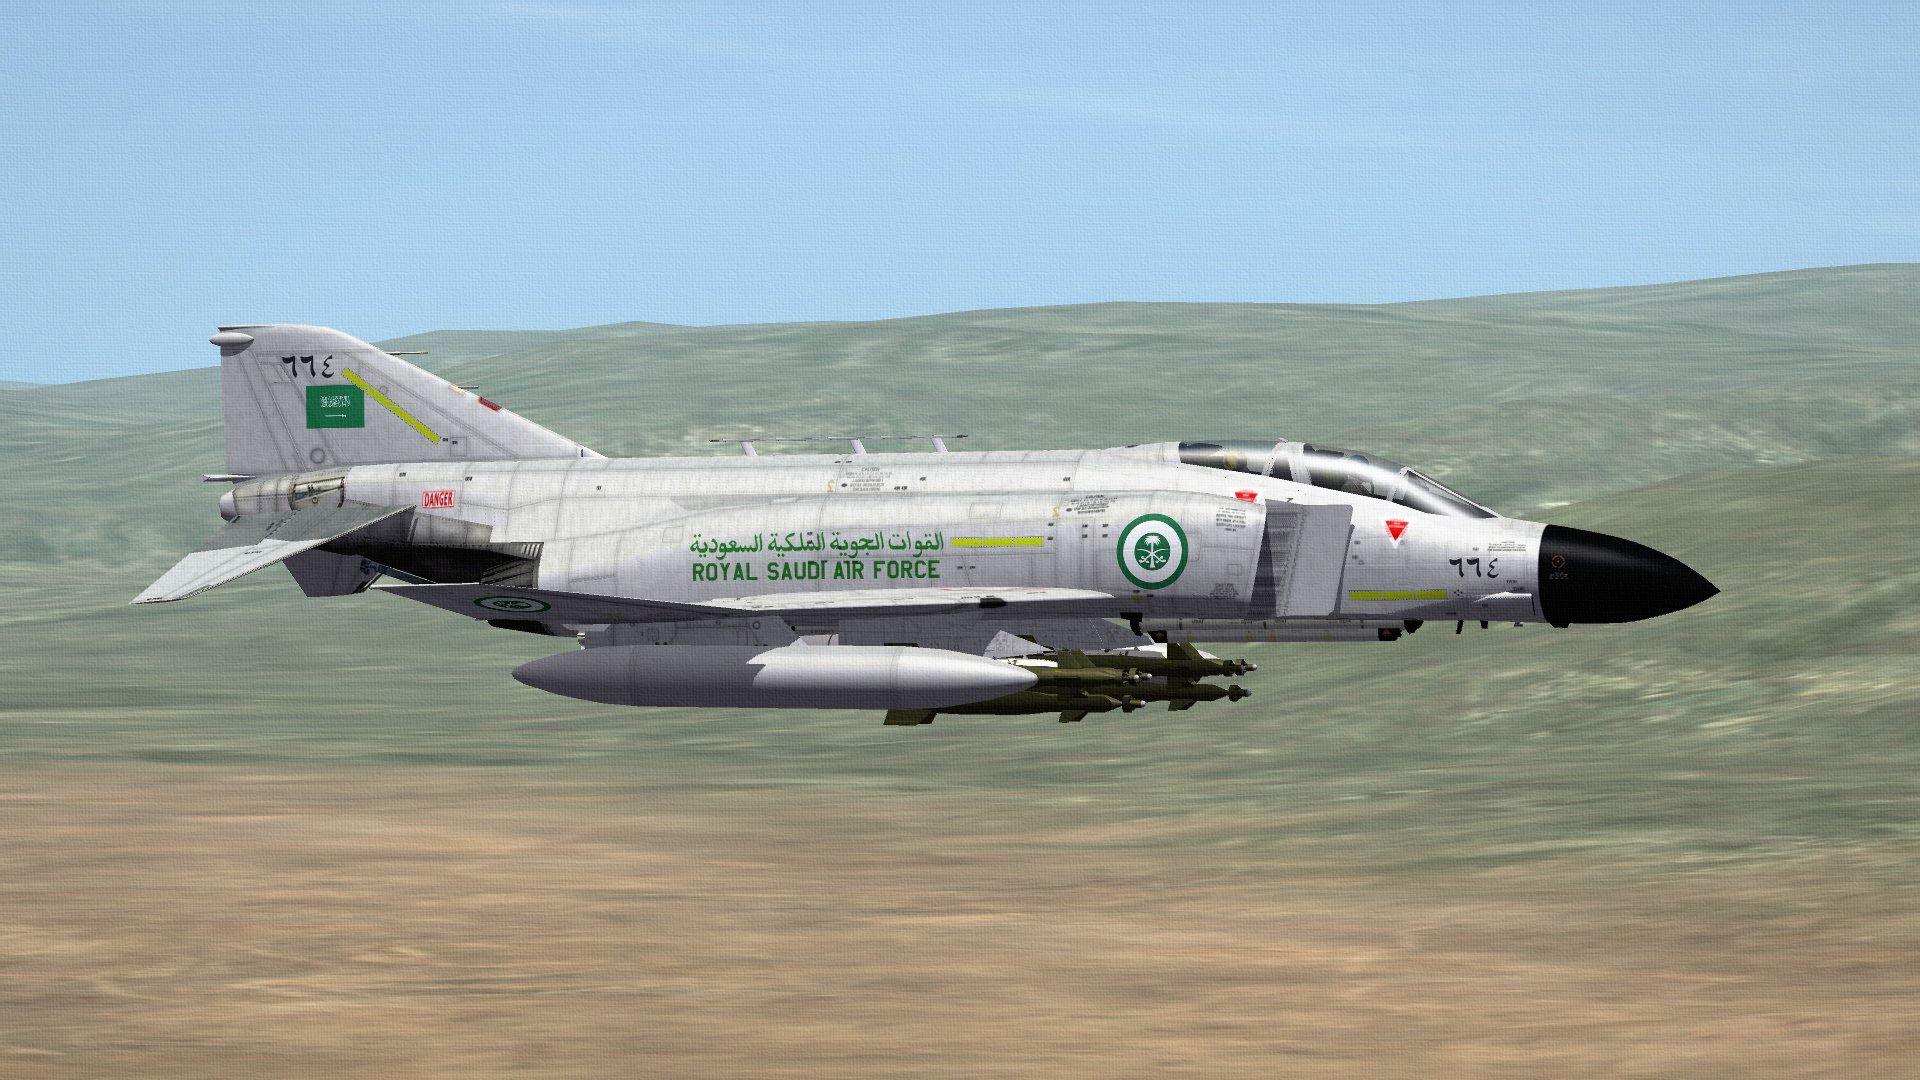 RSAFF-4PPHANTOM03_zpsc3860ec5.jpg